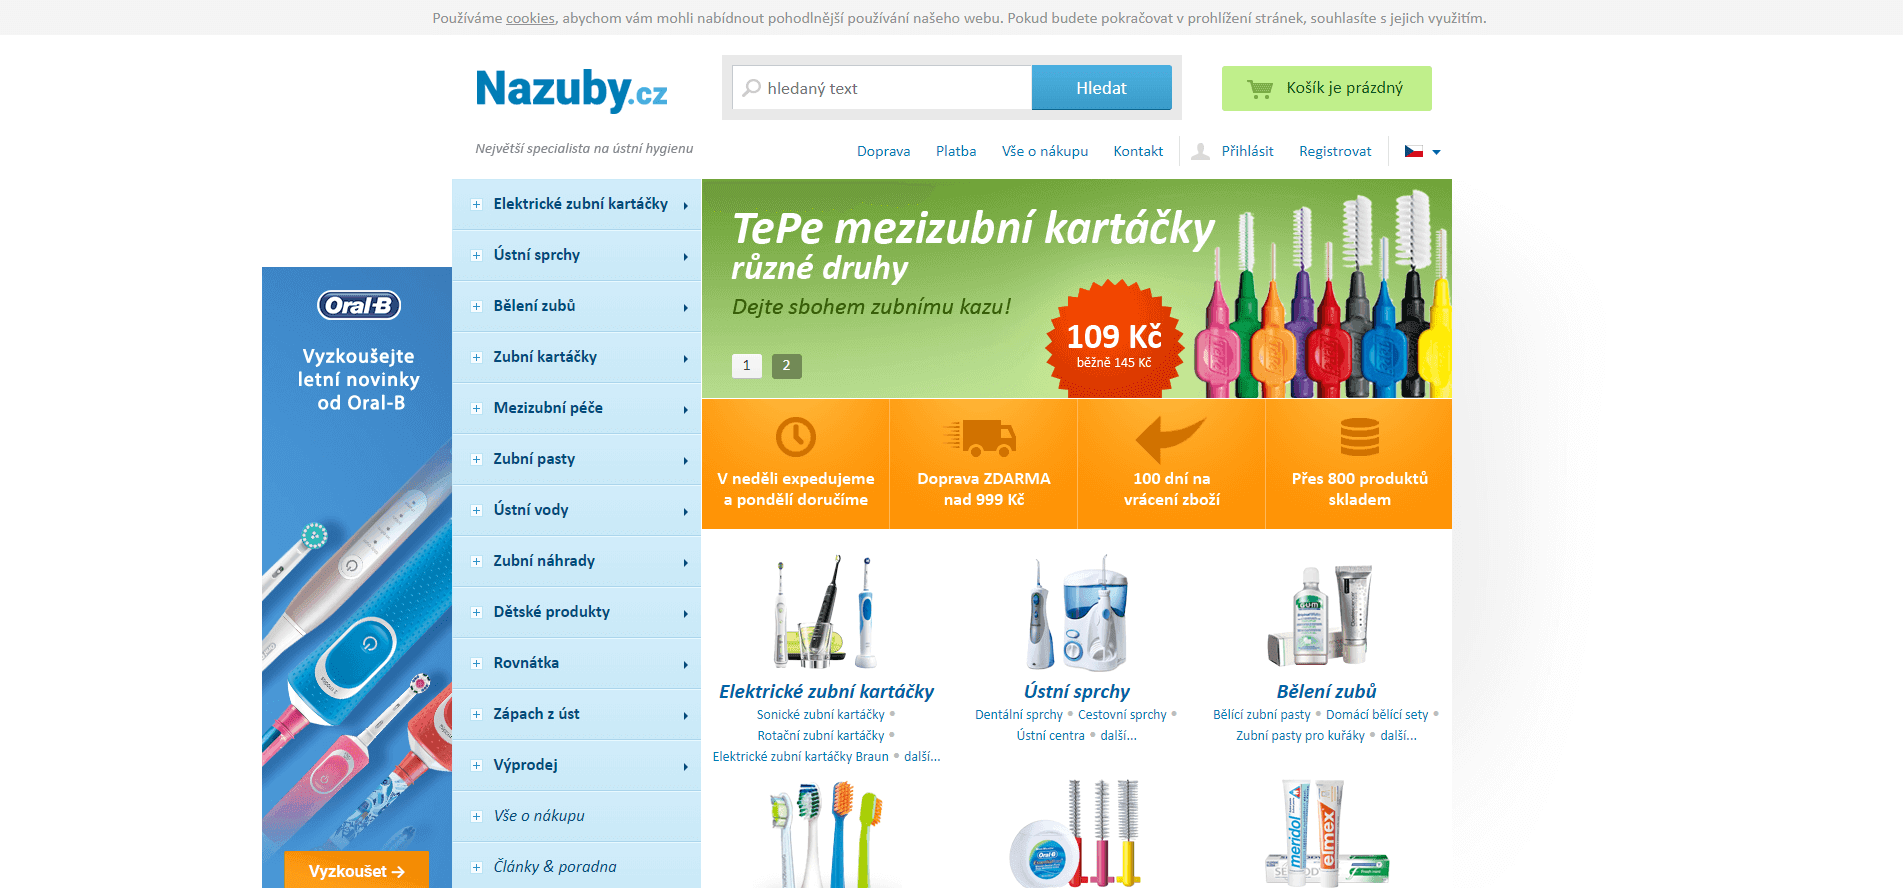 Nazuby купити онлайн з доставкою в Україну - myMeest - 2